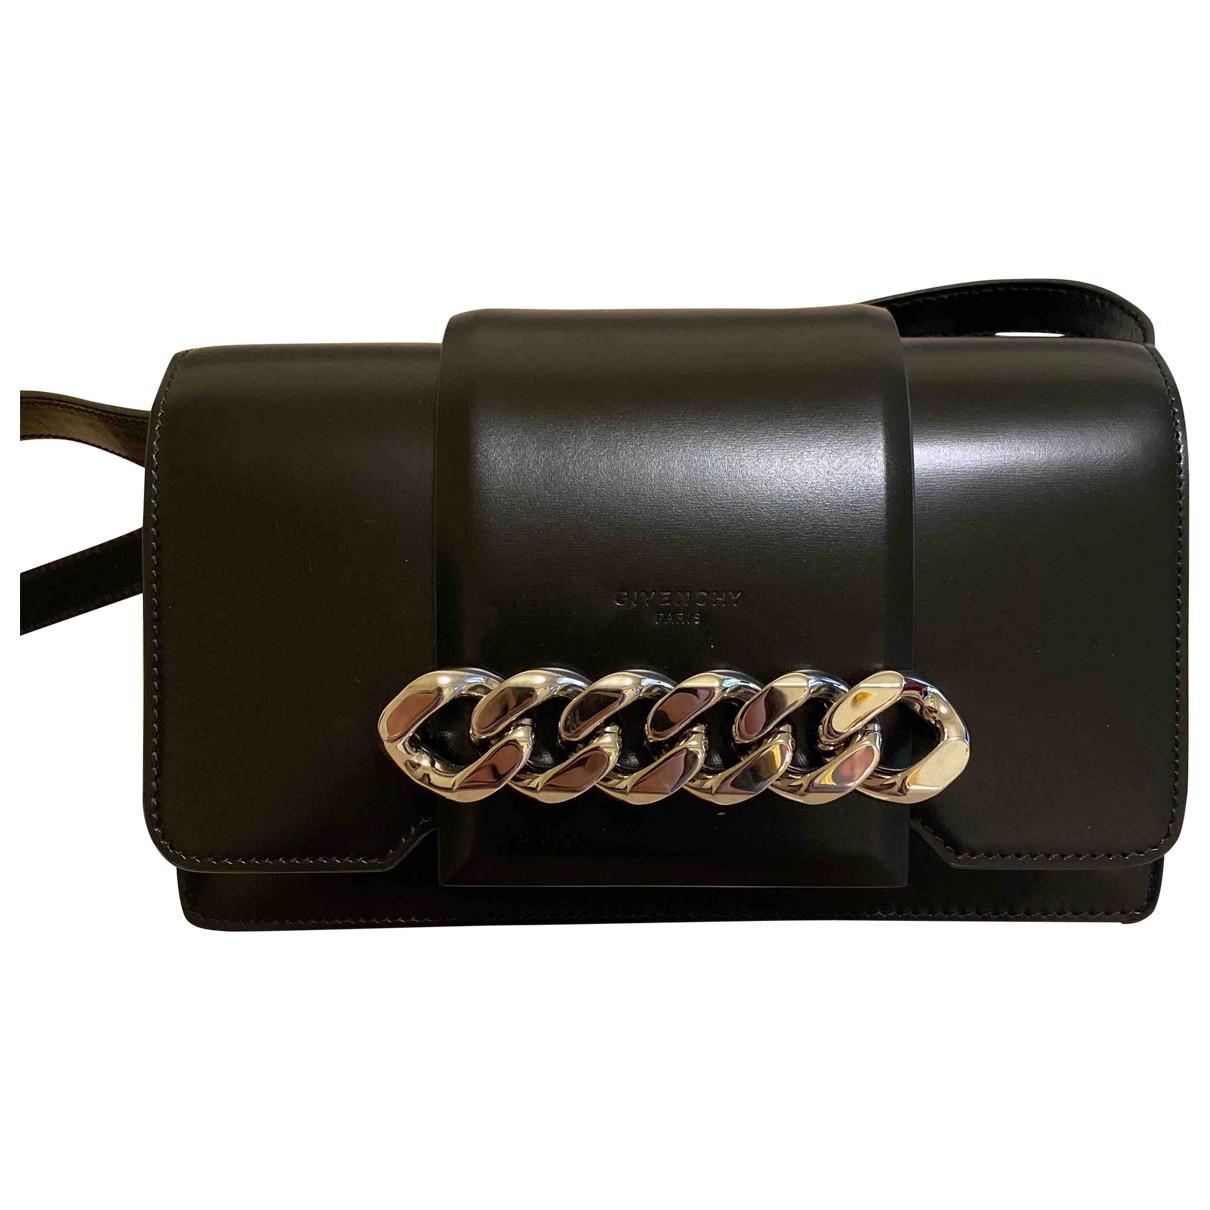 Givenchy - Sac a main Infinity pour femme en cuir - noir